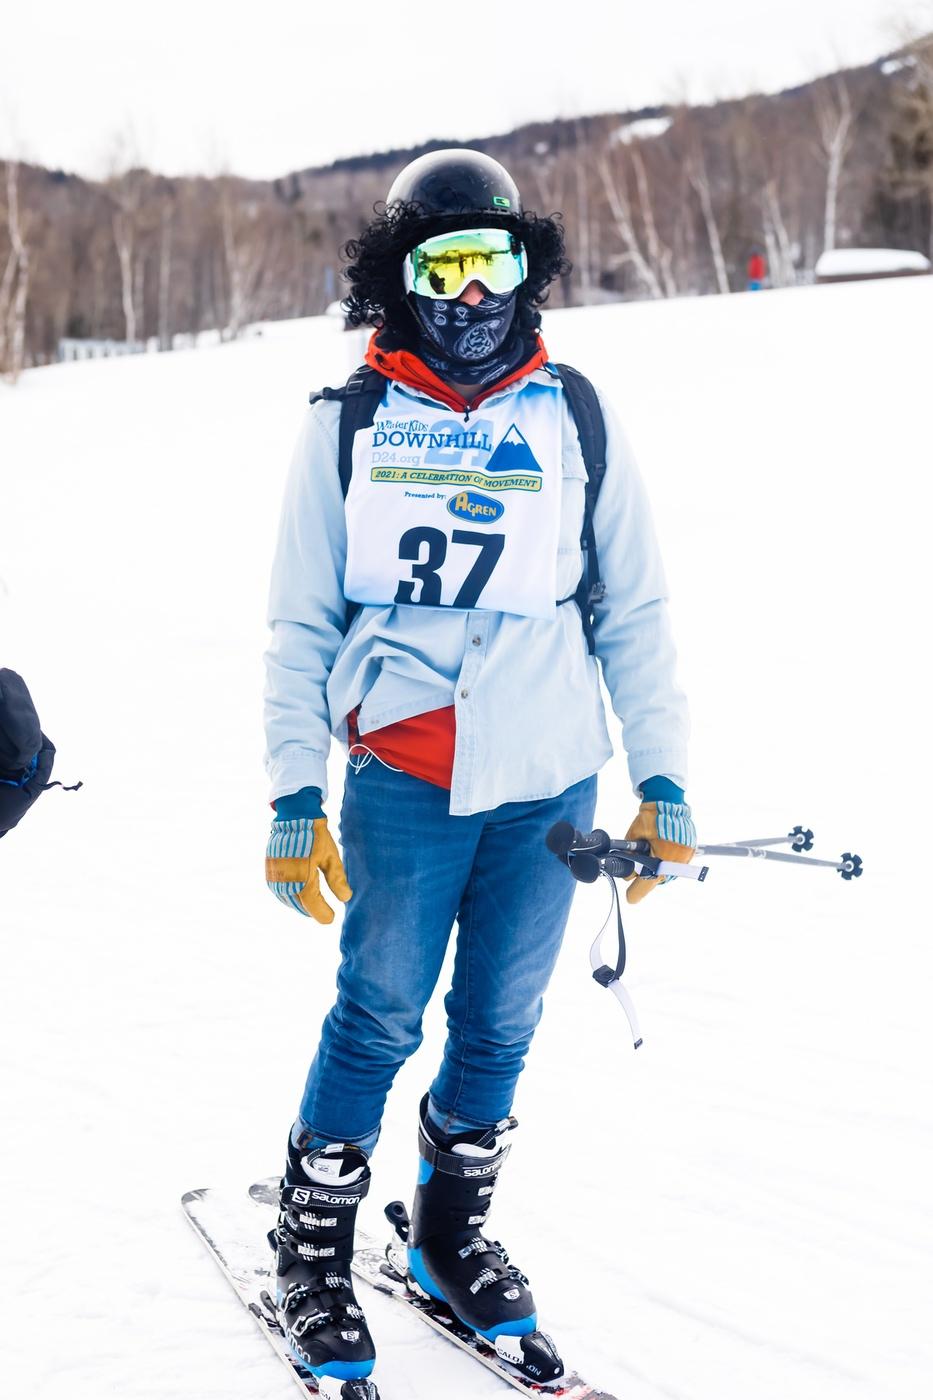 WinterKids Downhill 24 2021 SDP 2949